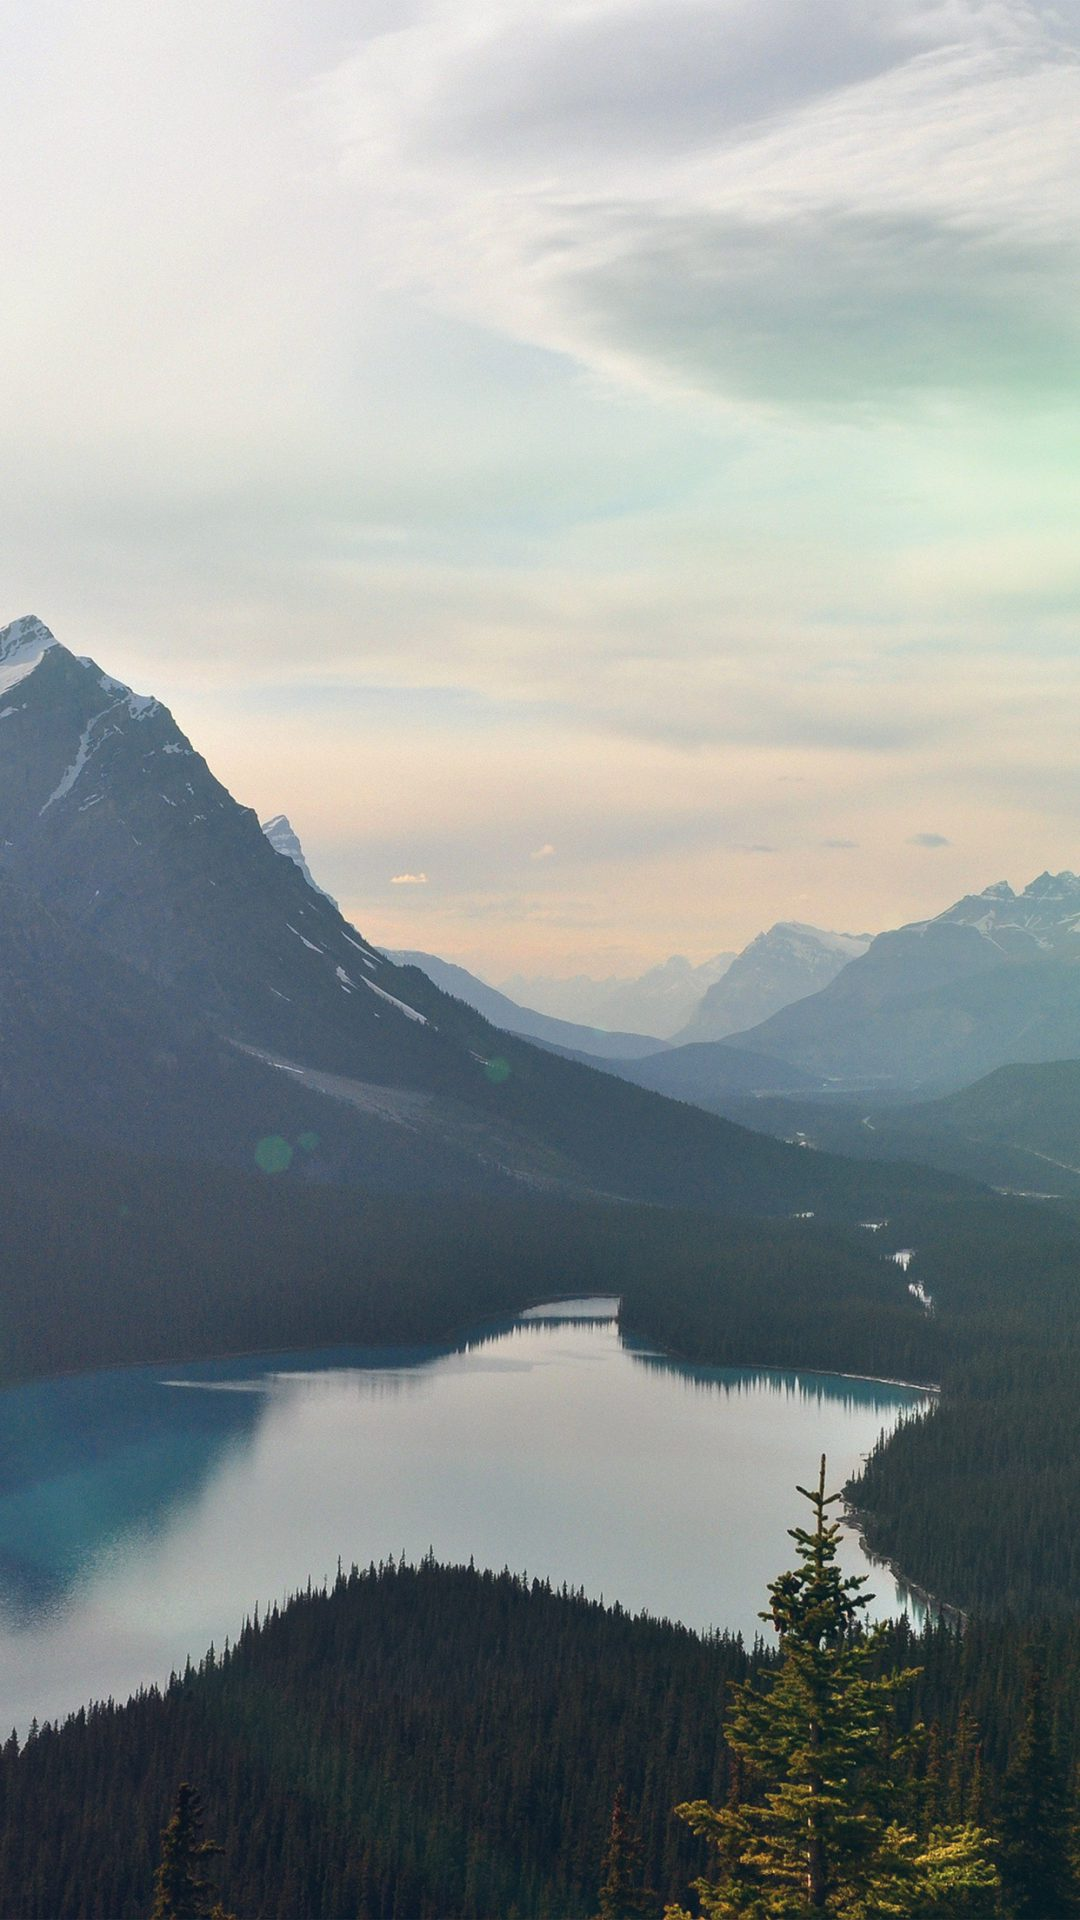 Lake Mountain Sky Clear Nature Flare